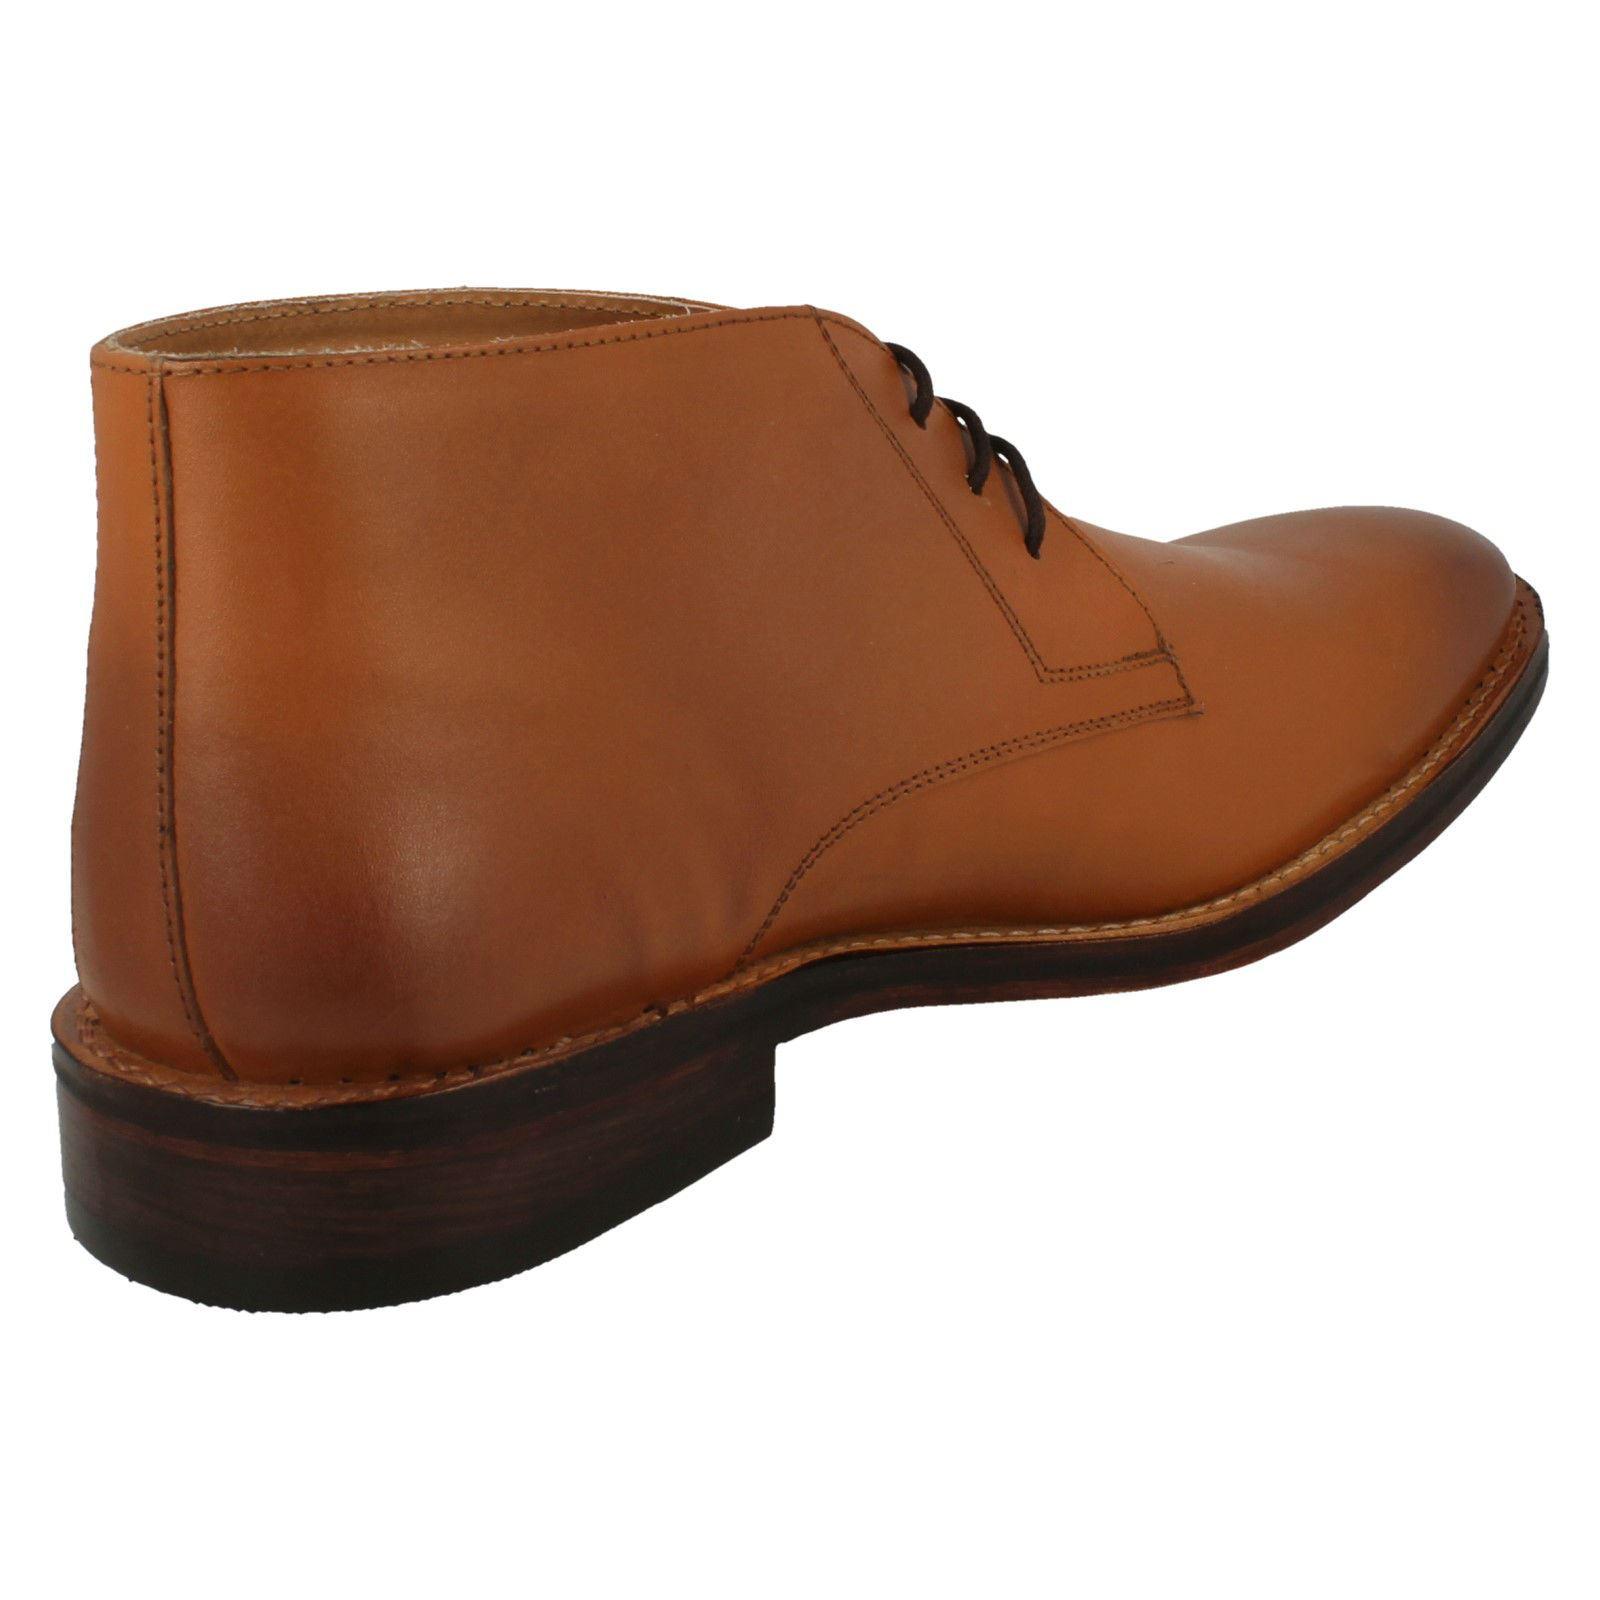 Mens-Catesby-Smart-Desert-Boot-MCW159T thumbnail 9